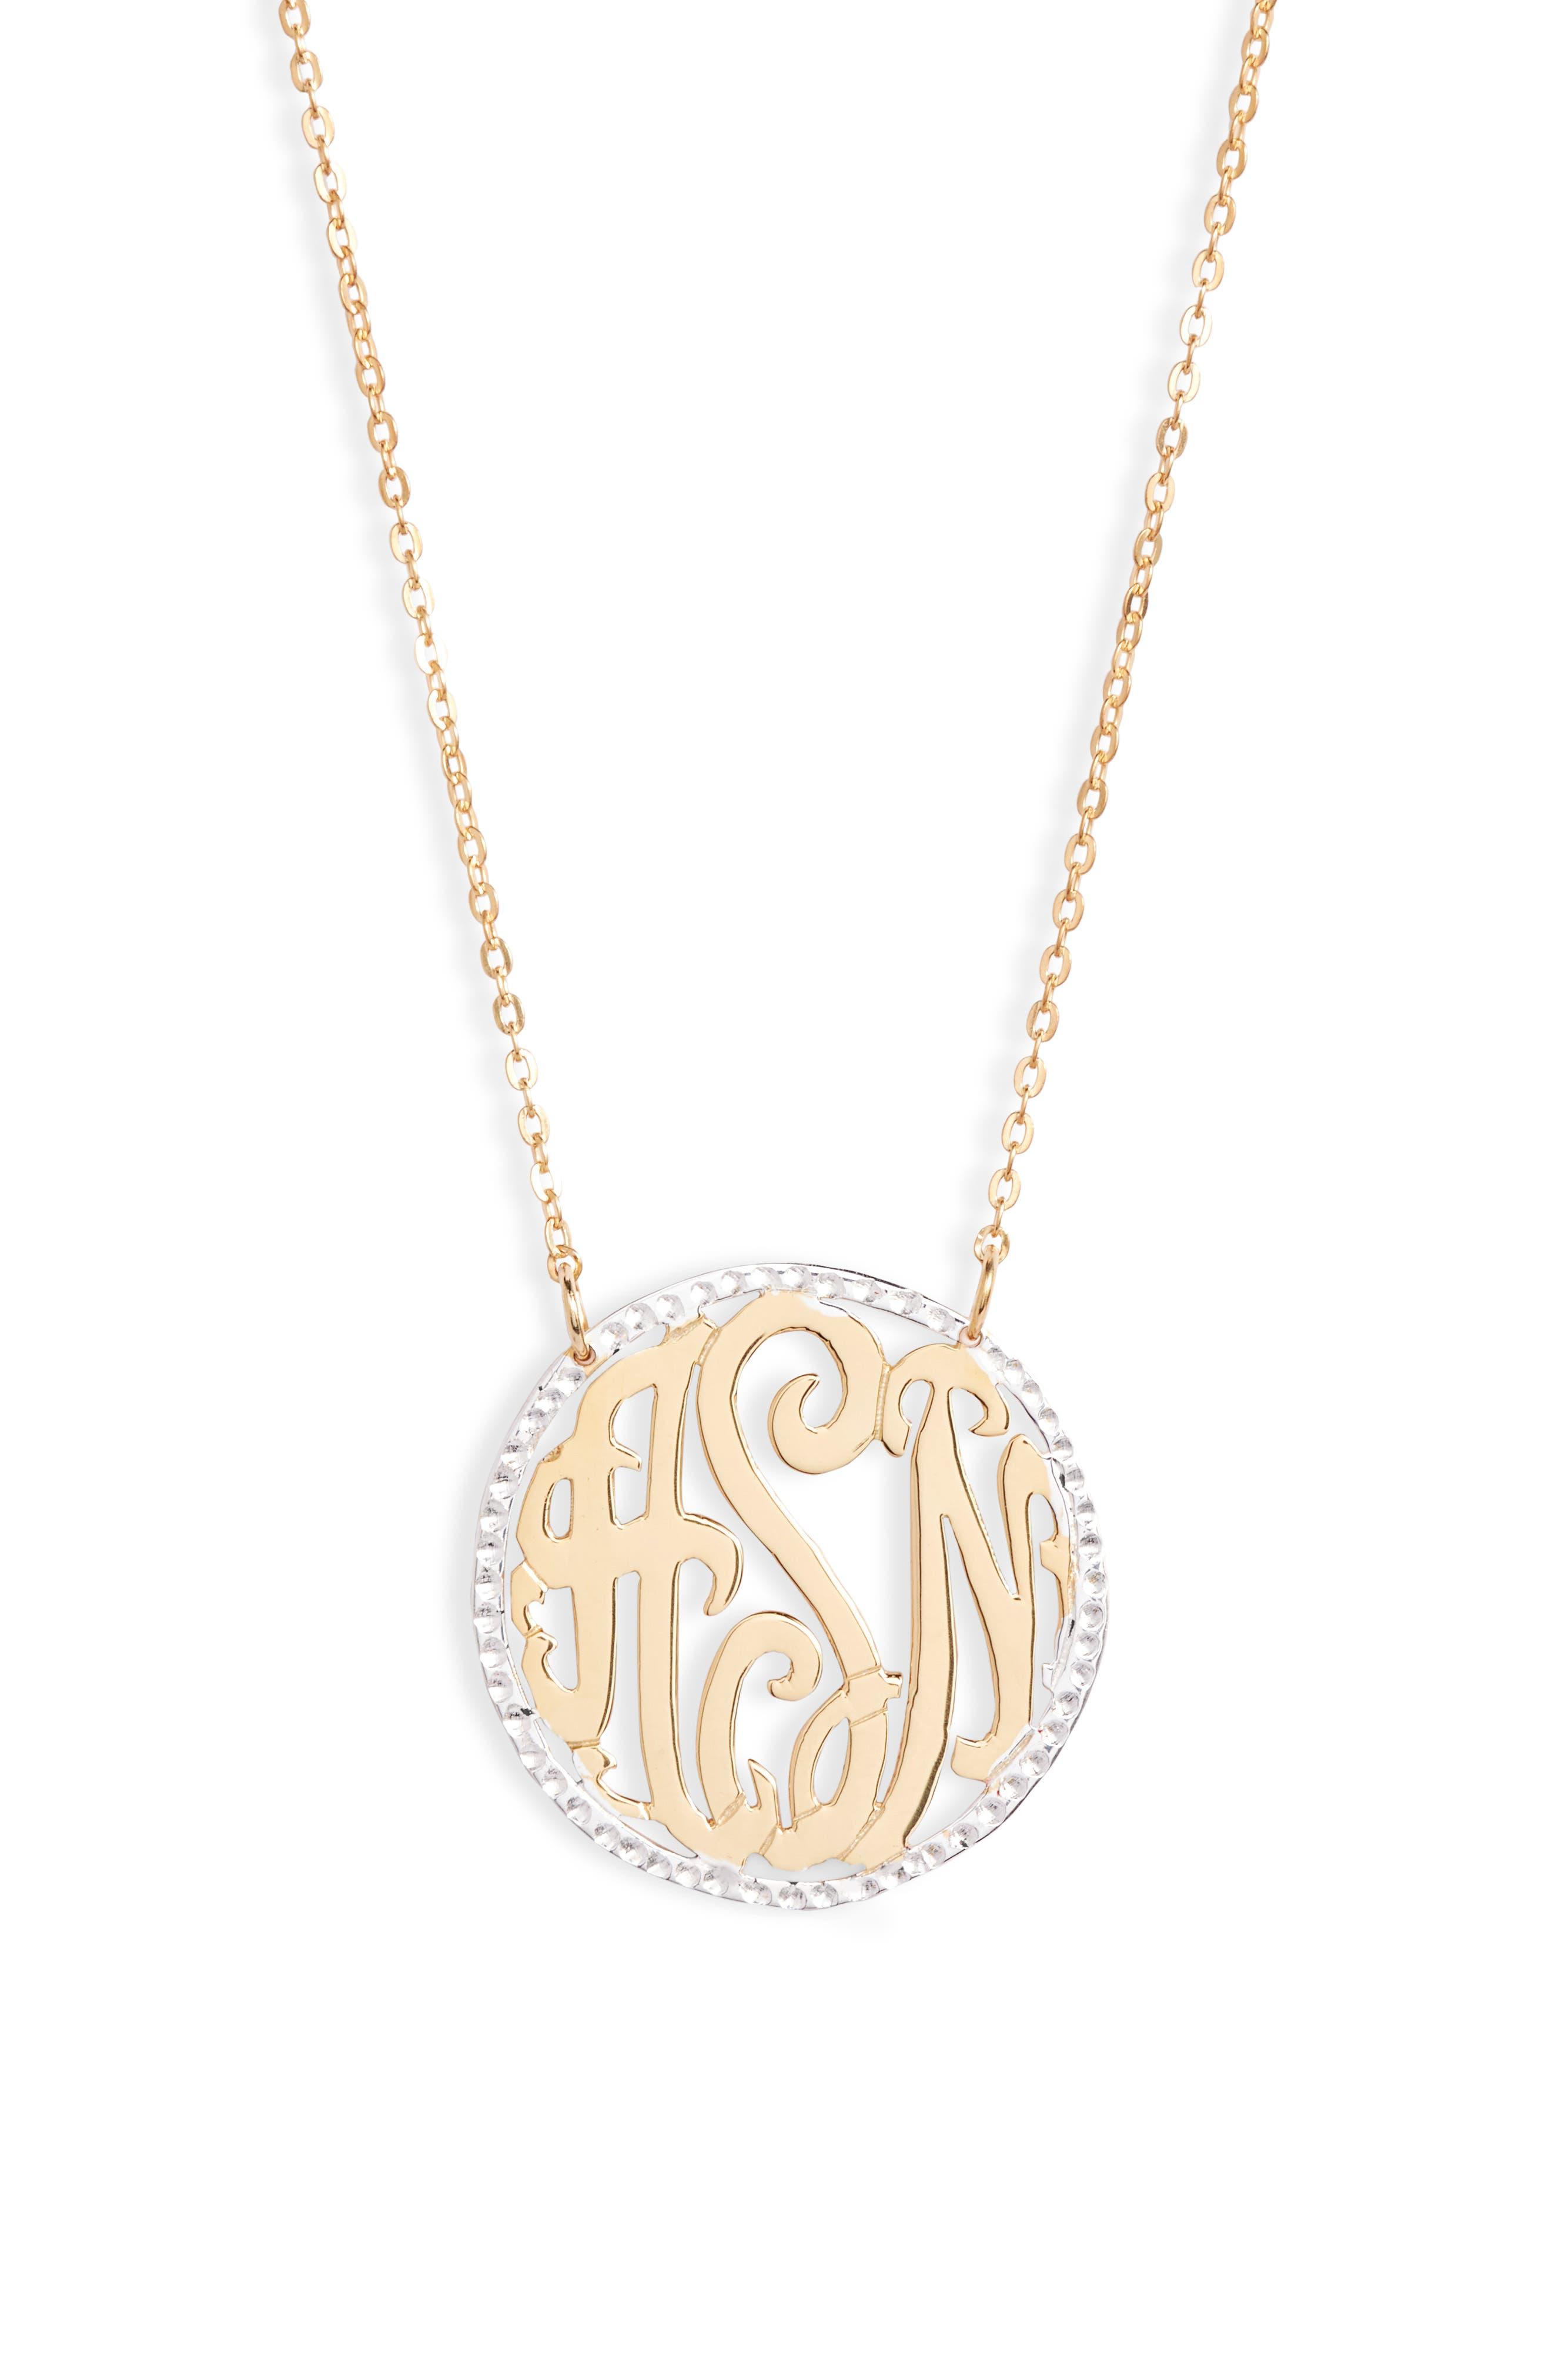 Women's Argento Vivo Personalized Three Initial Pendant Necklace